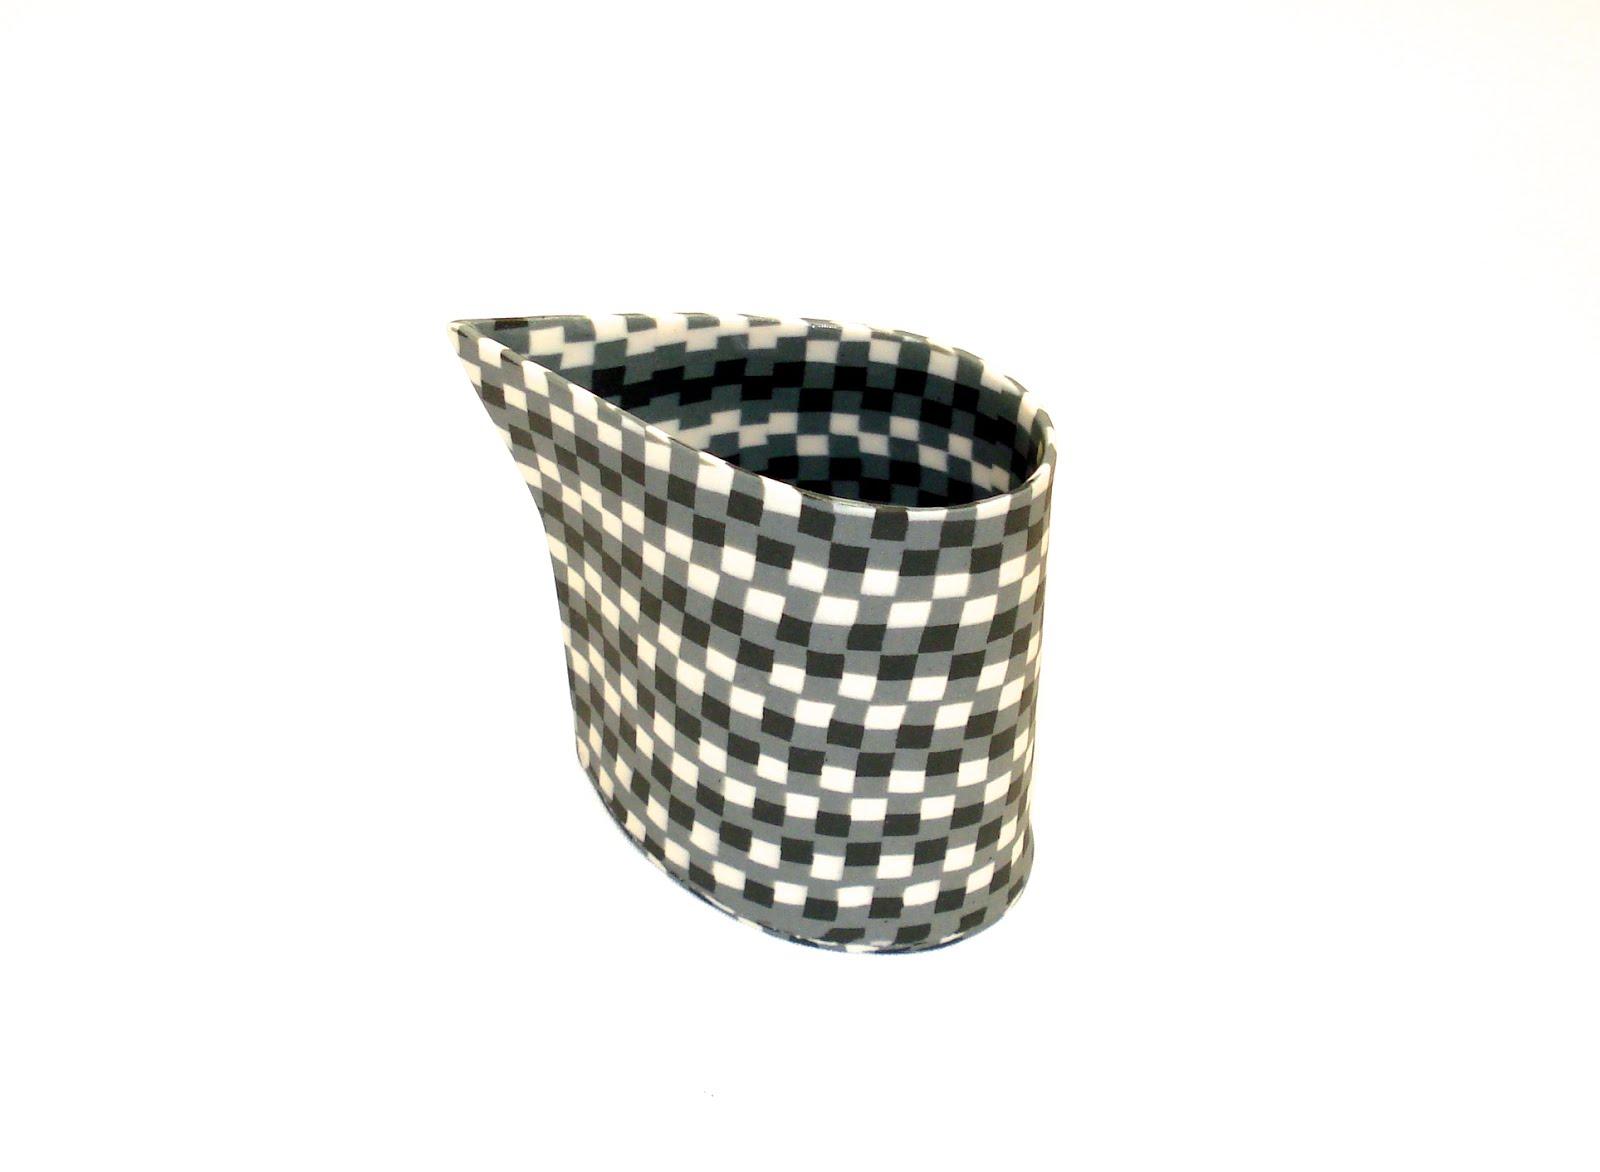 Mandy Cheng Porcelain Nerikomi Taiwan Ceramics Biennale